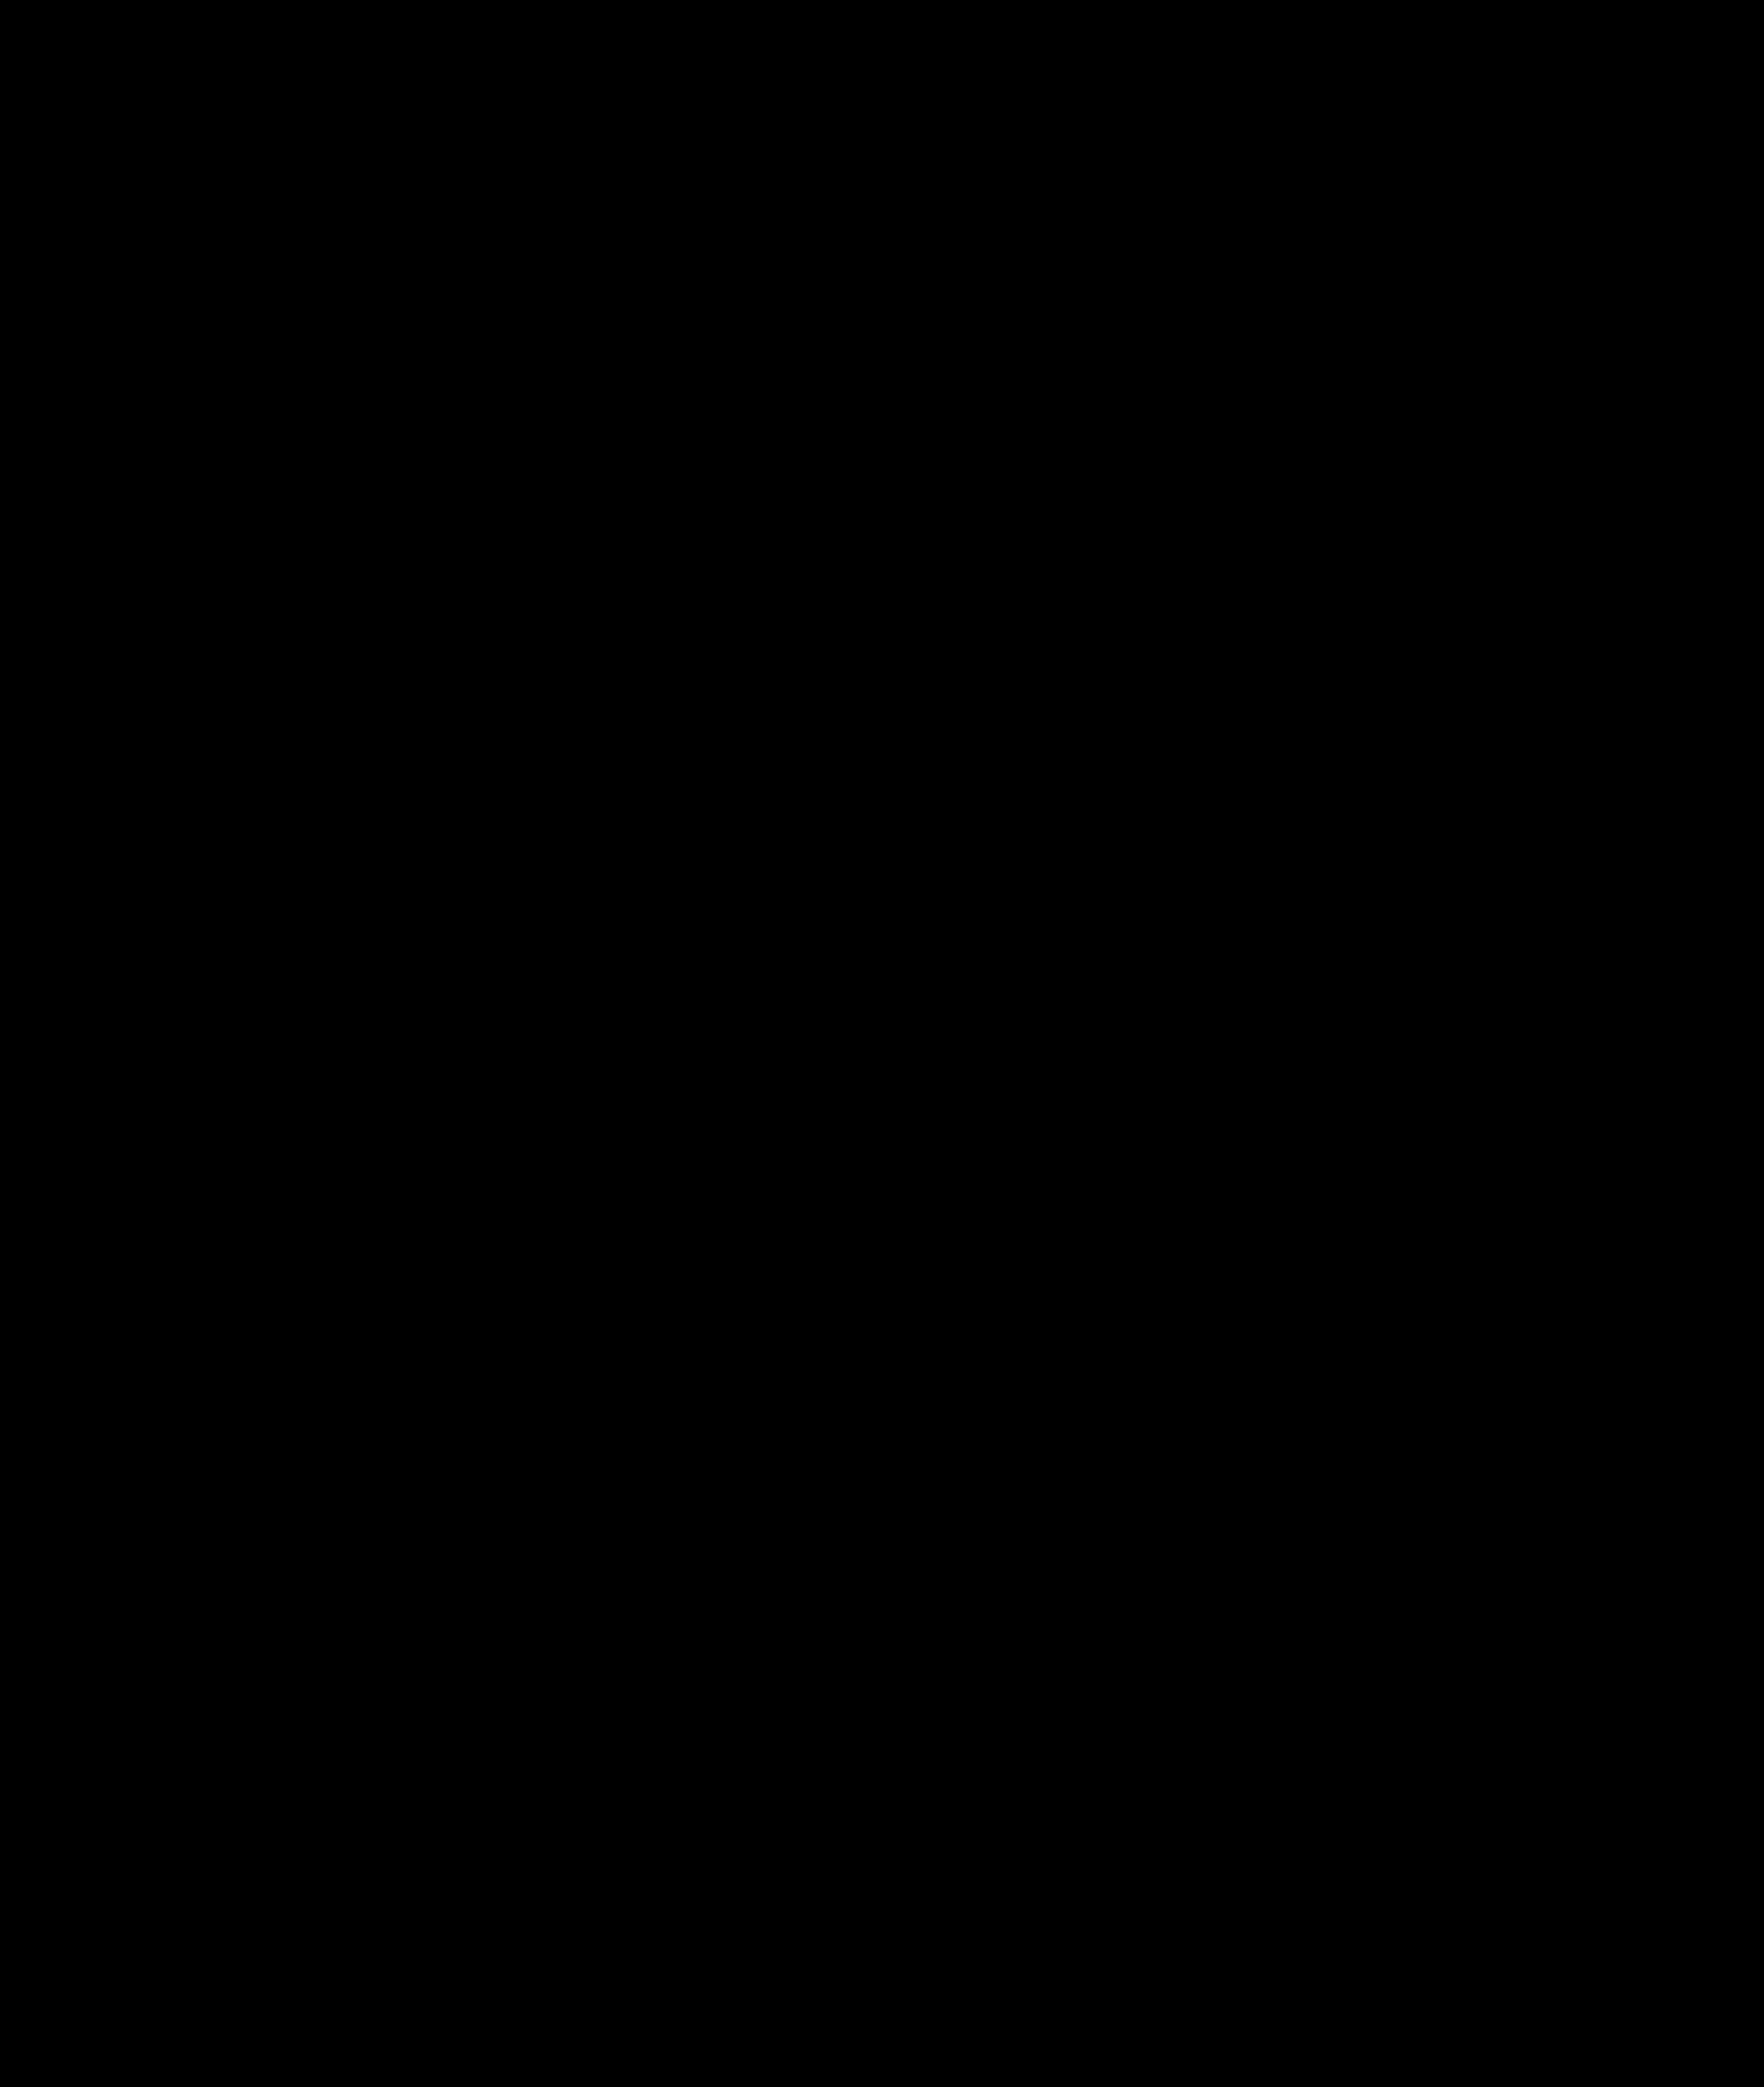 File hand svg wikimedia. Handprint clipart black and white